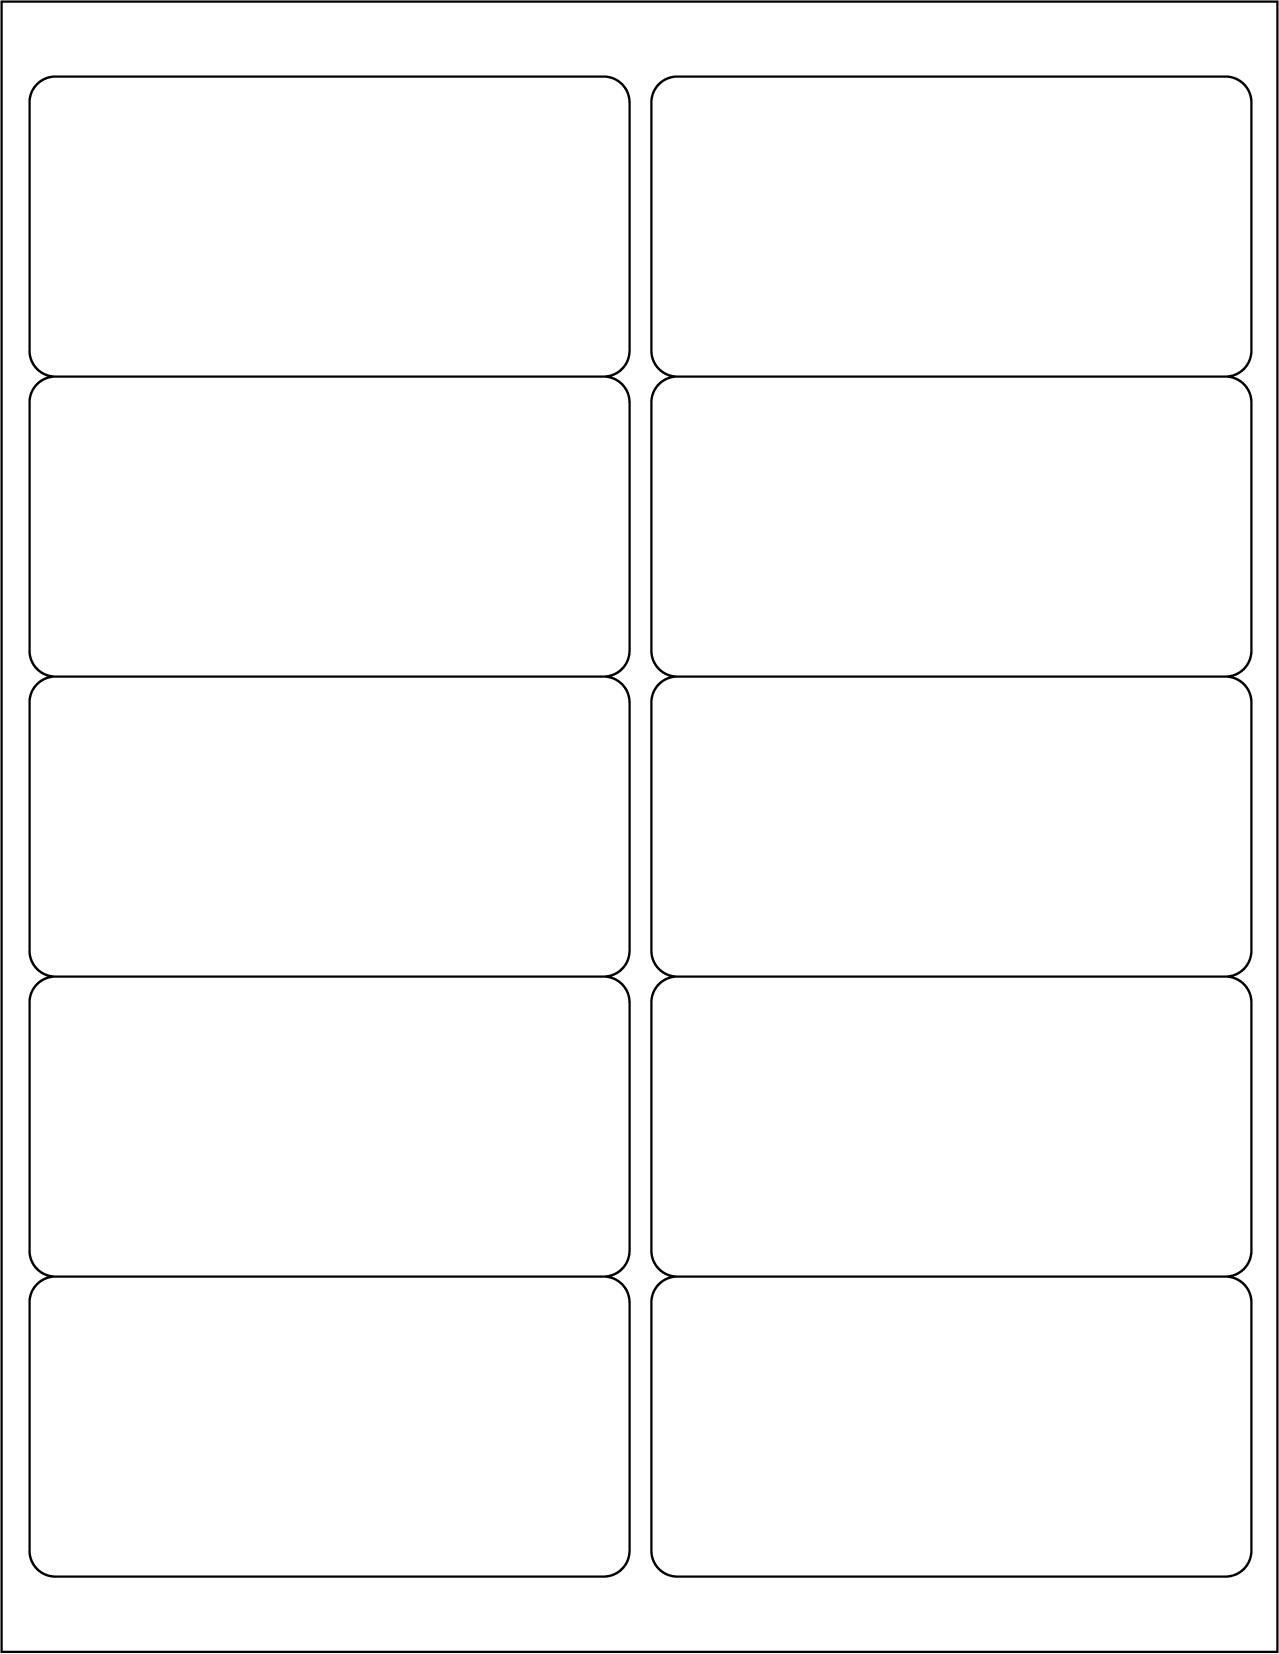 13 Design Free Printable Label Template Word Images - Free Printable - Free Printable Label Templates